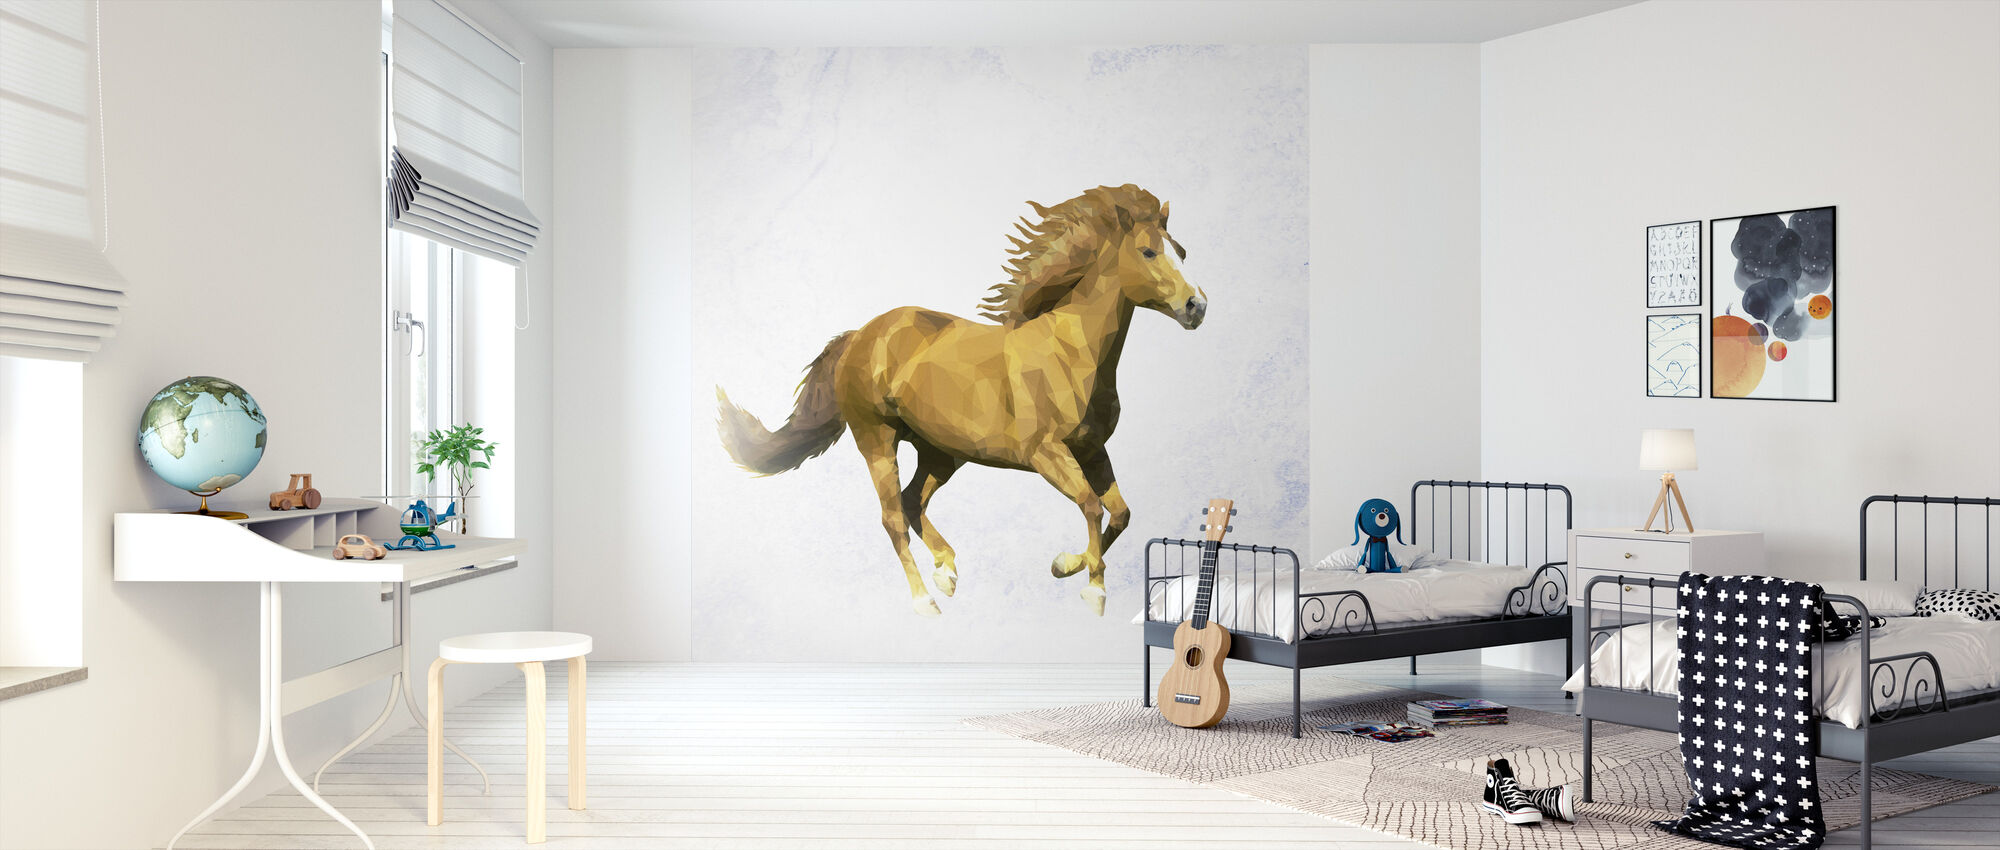 Polygon Horsy Golden - Wallpaper - Kids Room